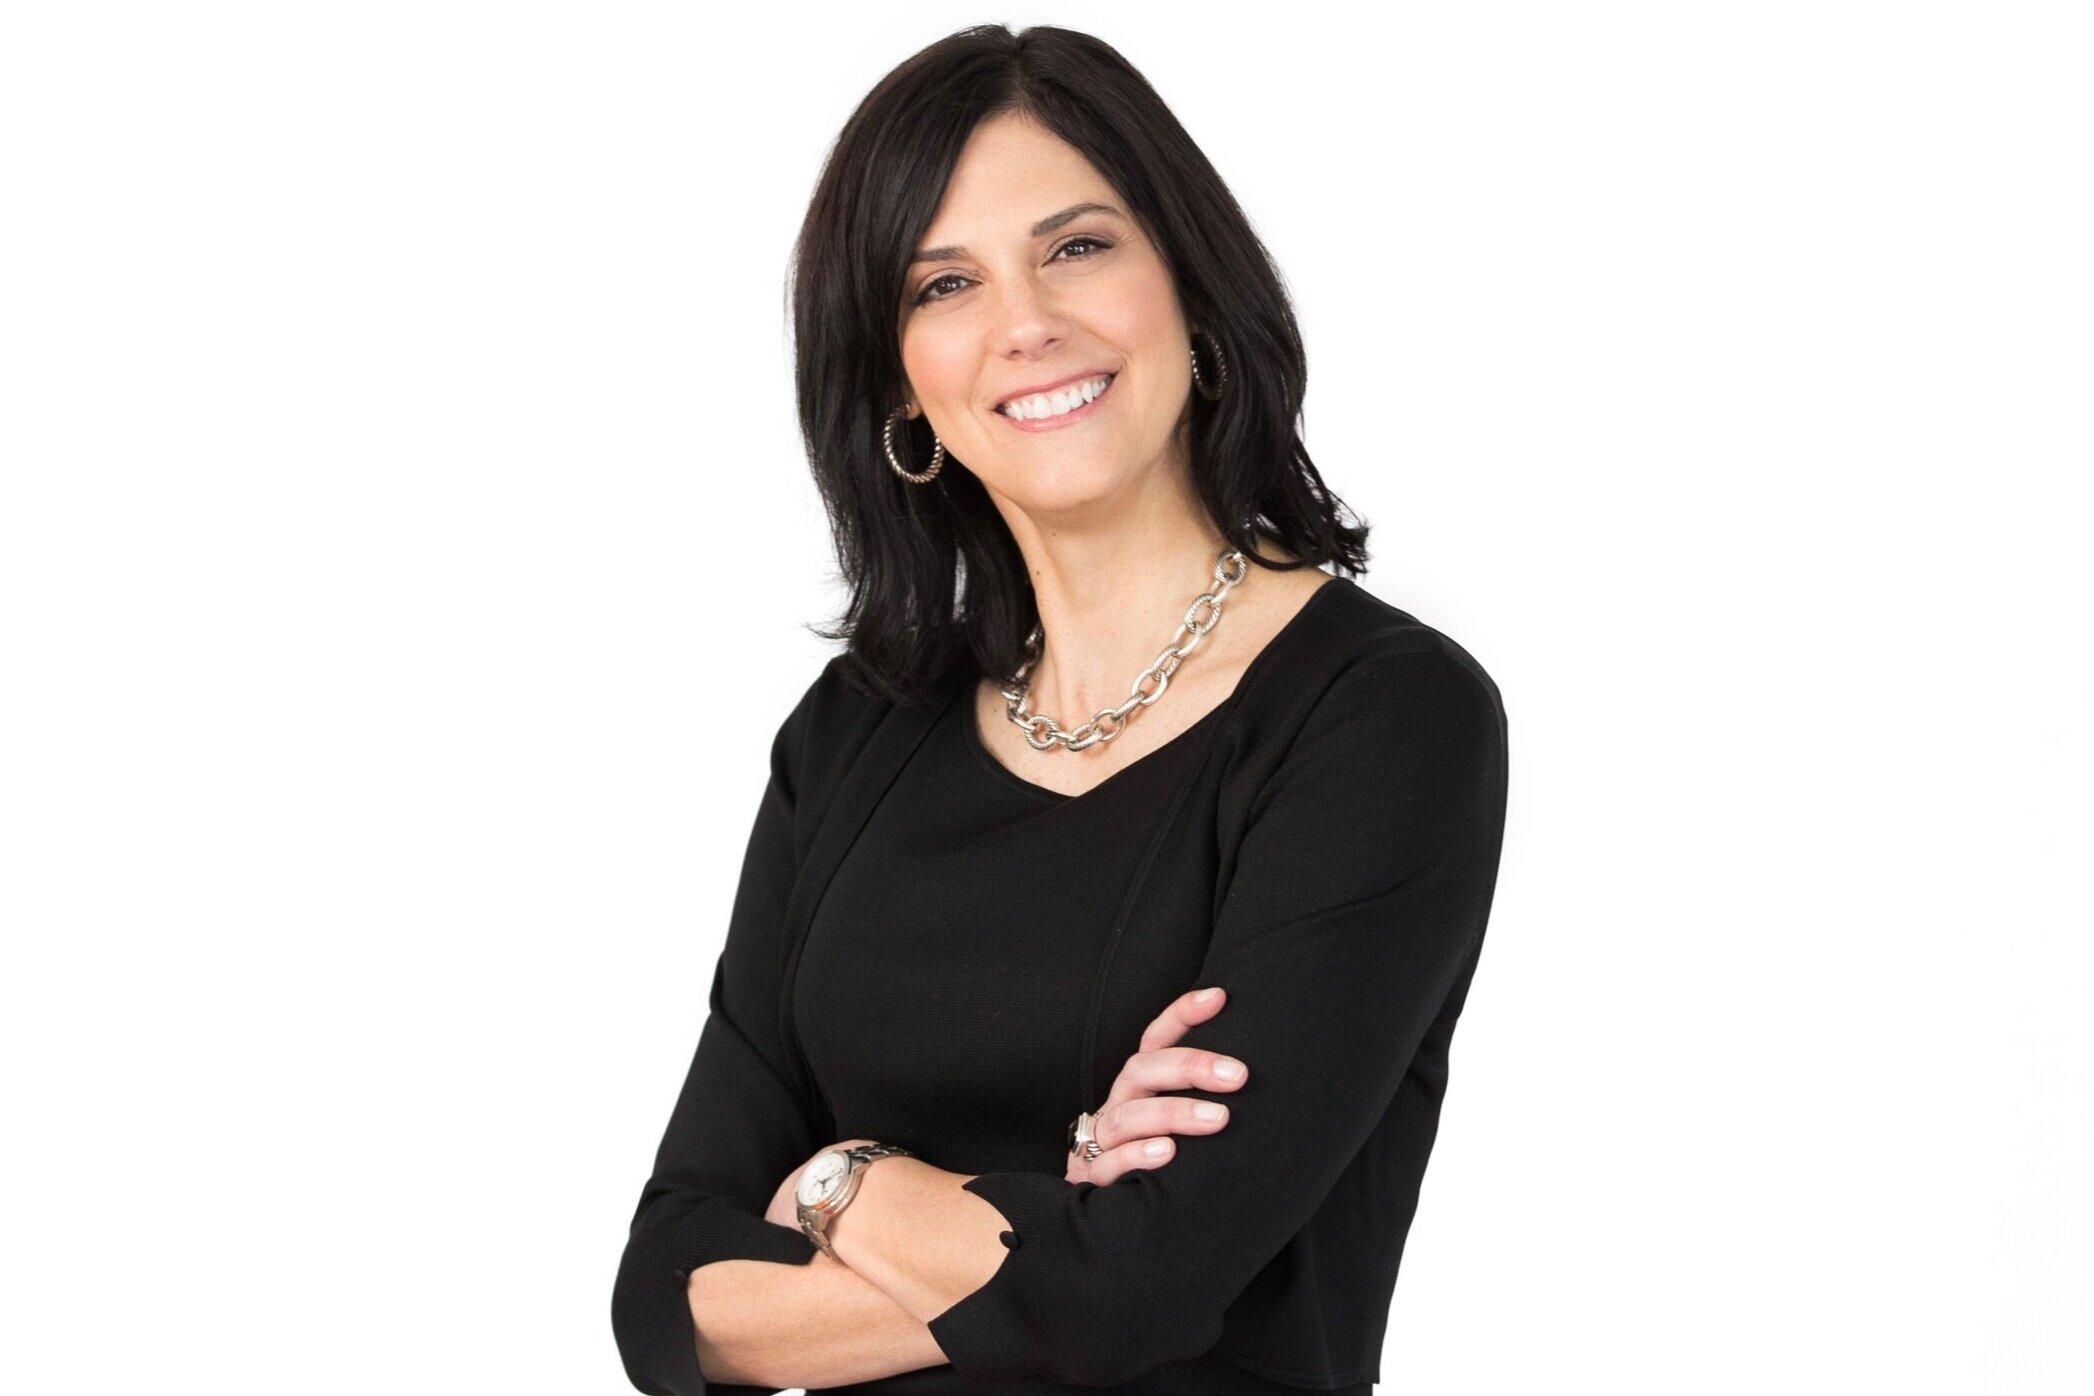 Brenda Ockun, Publisher of Stepmom Magazine - What the OG Stepmom Wants you To Know